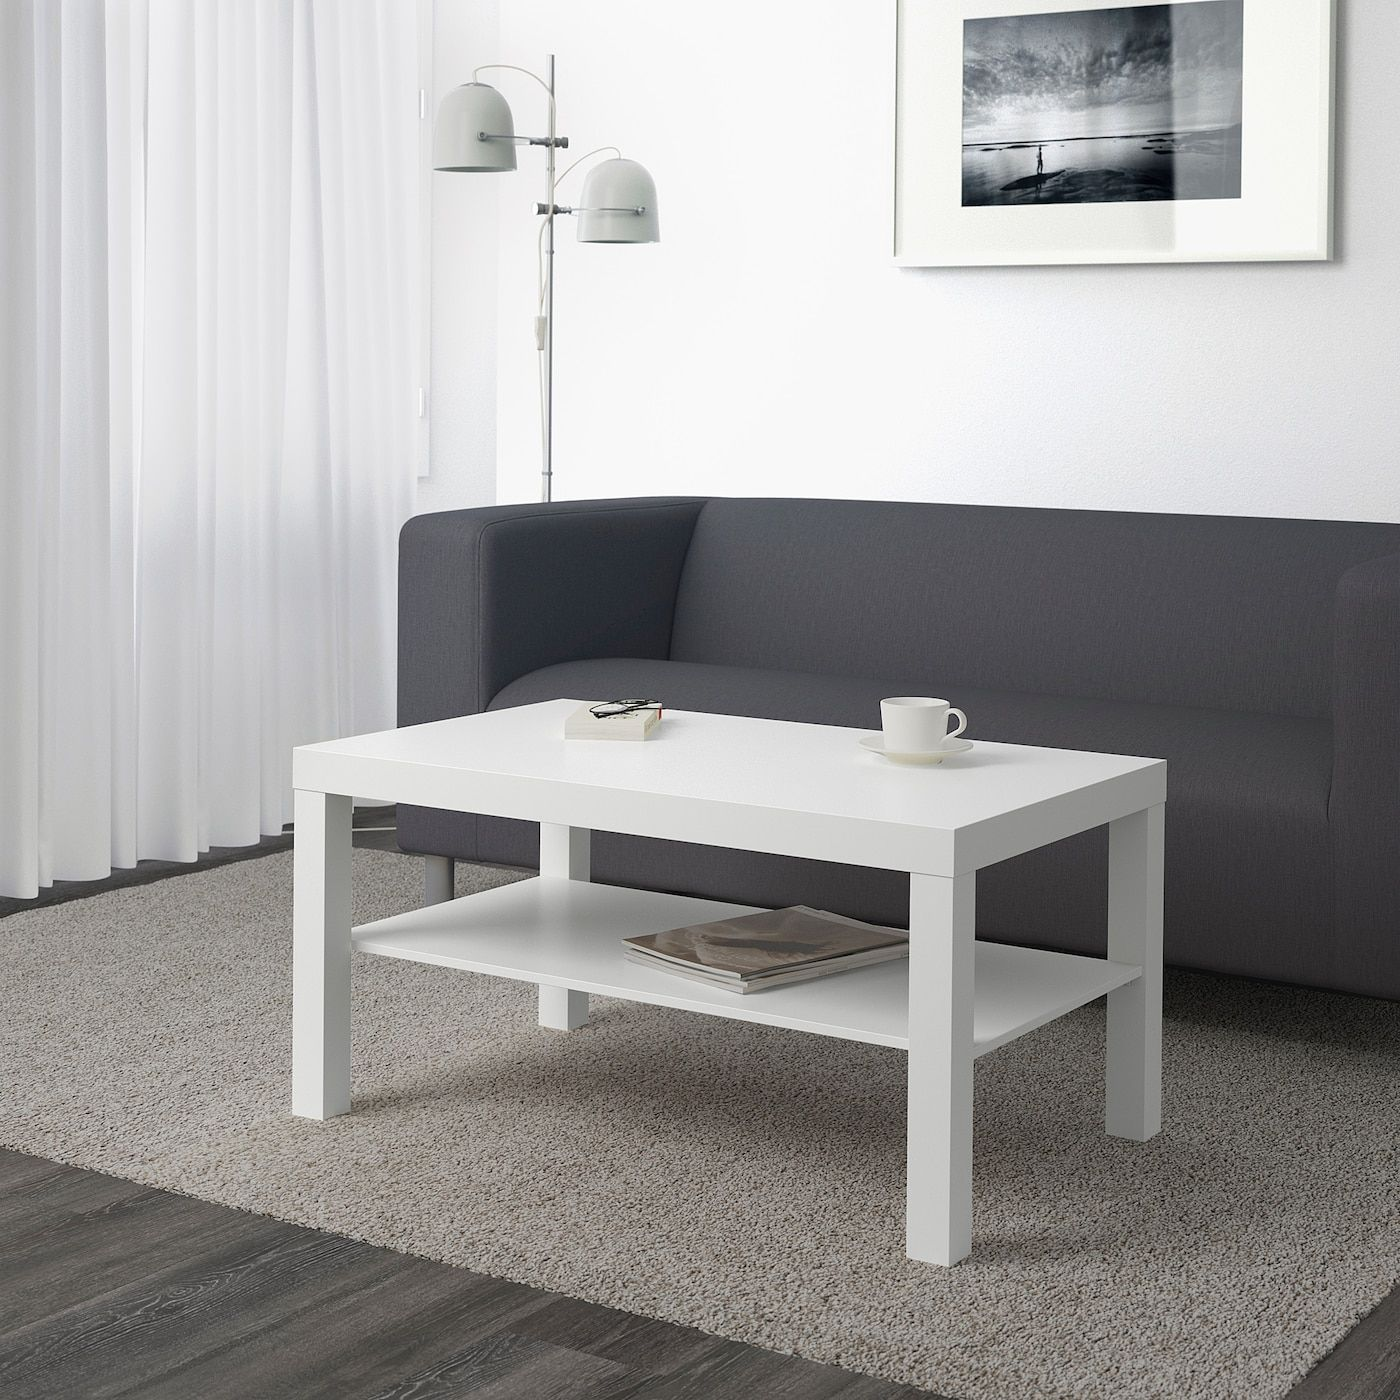 "LACK Coffee table white 35x22x18"" Ikea lack coffee"